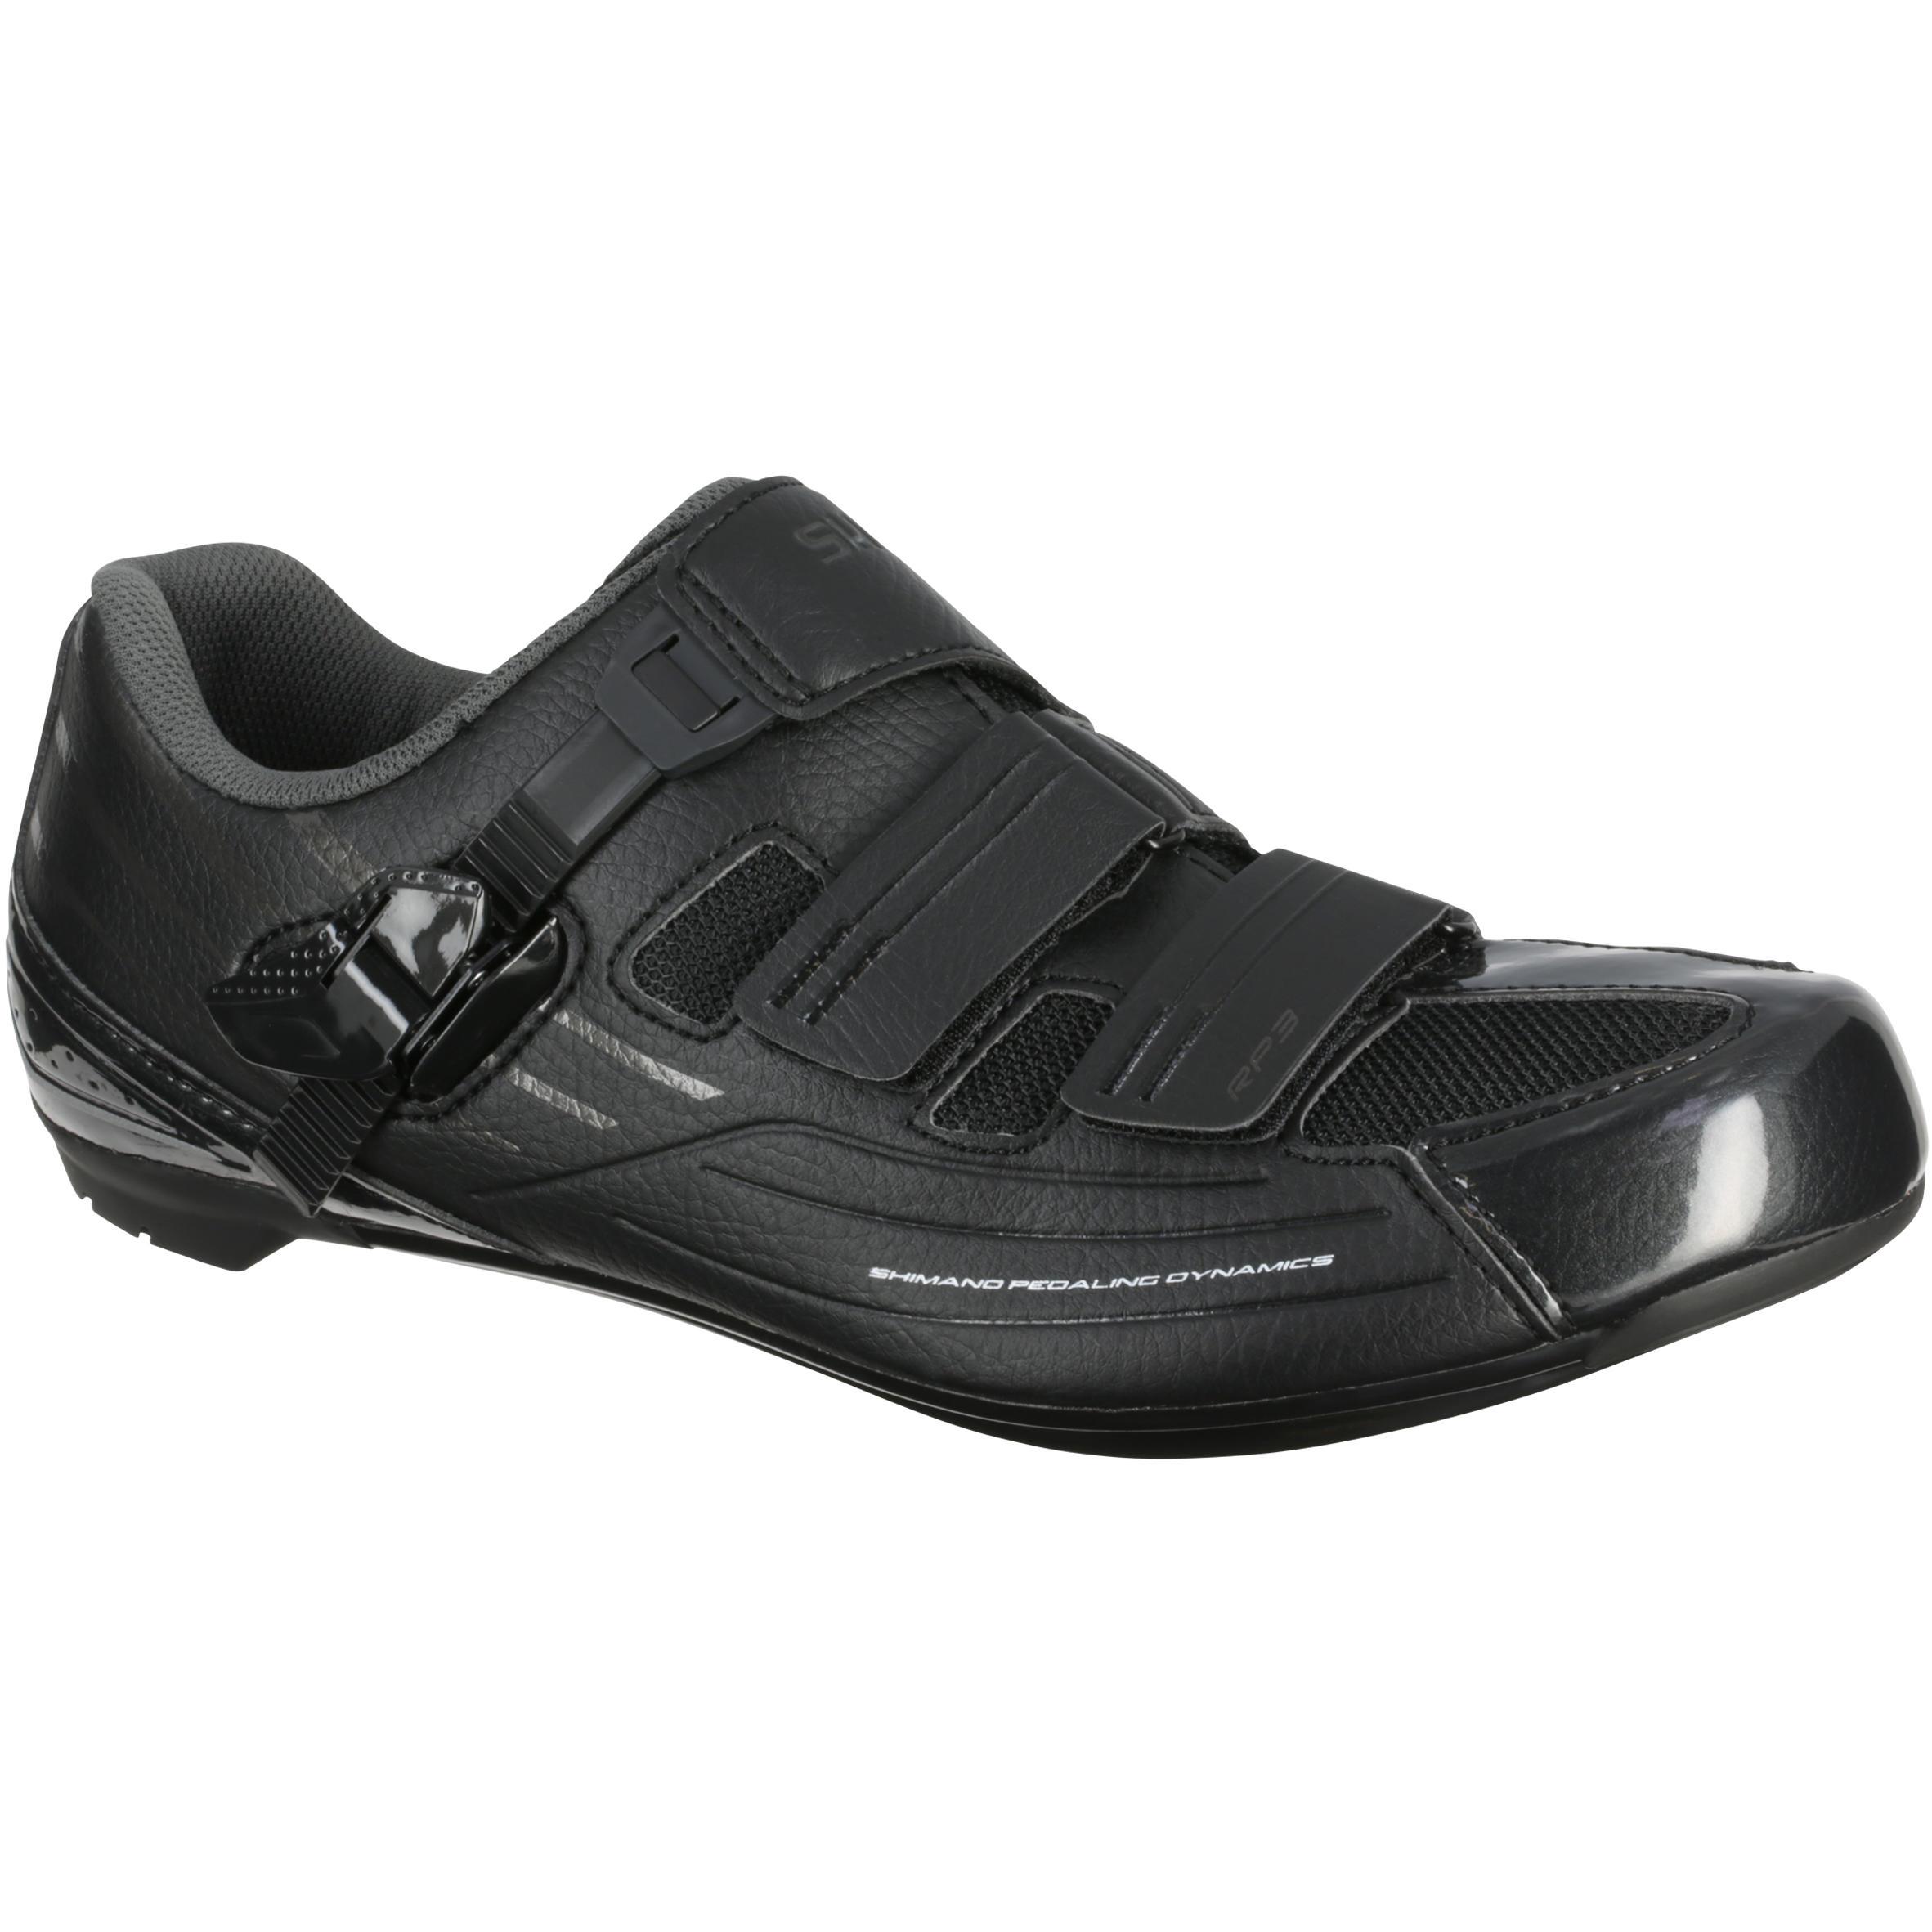 Chaussures vélo route SHIMANO RP3 noir - Shimano